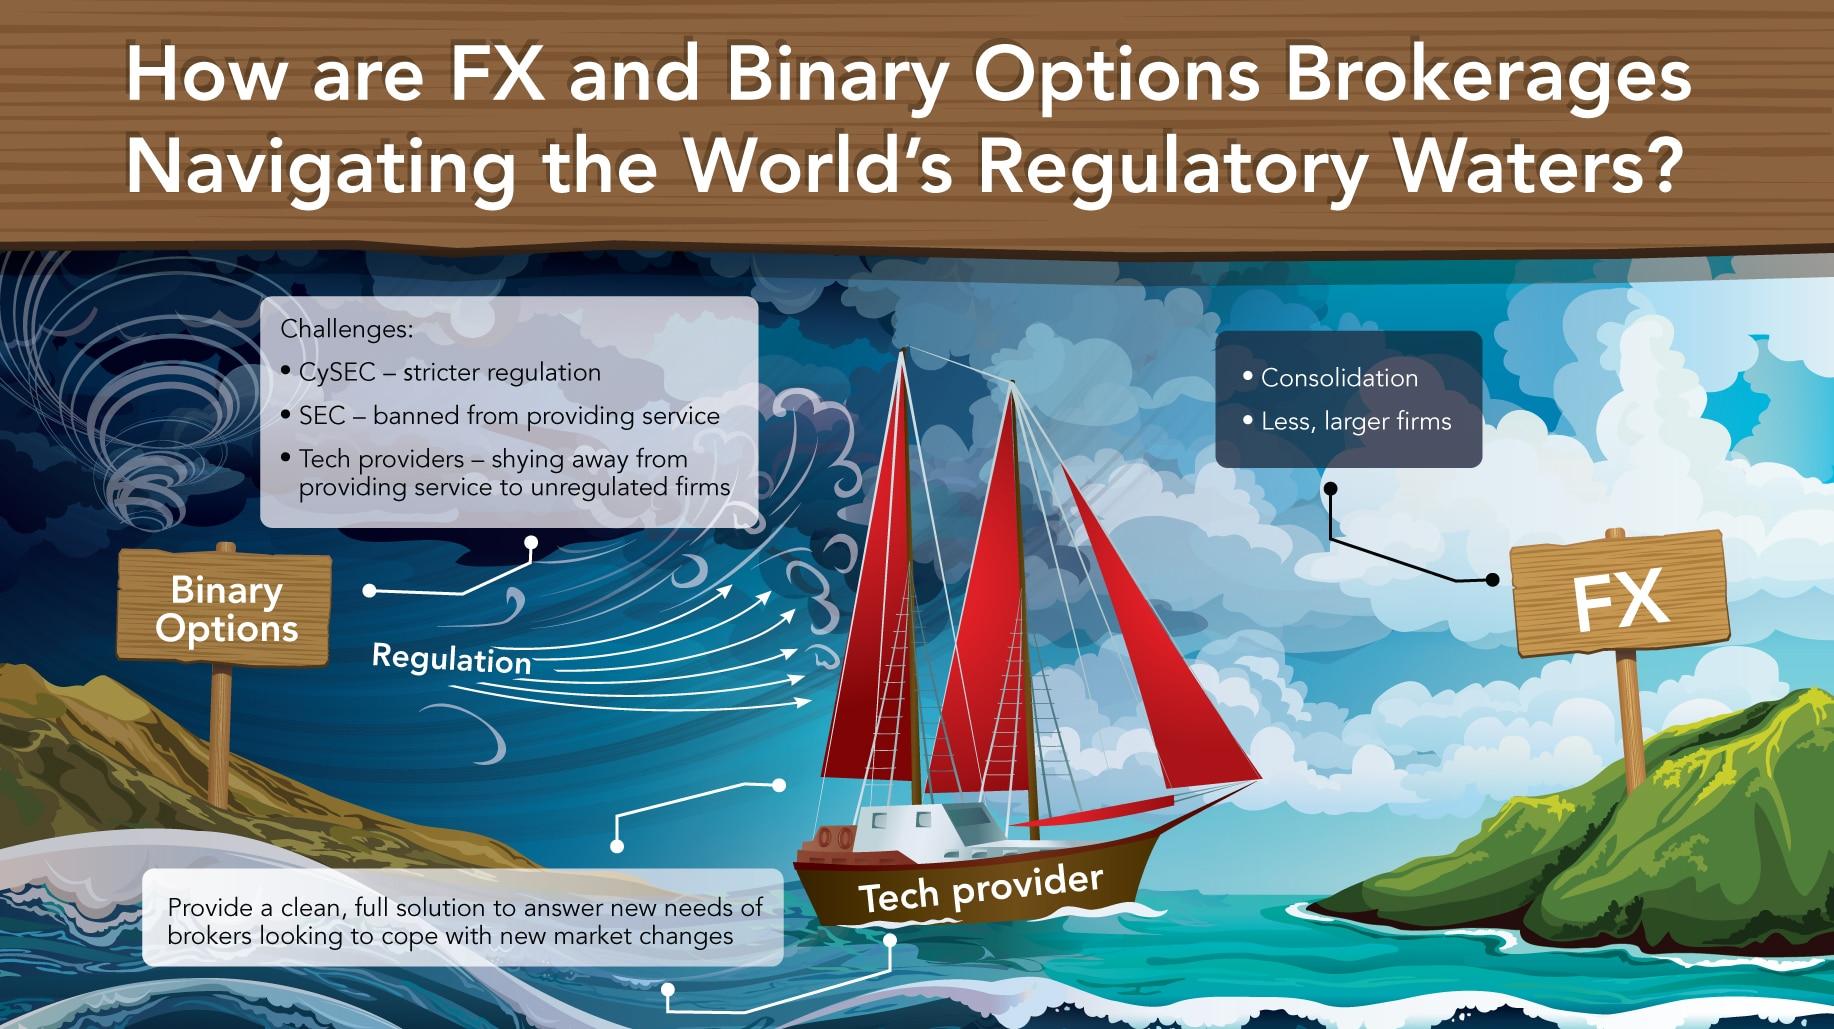 Future Binary Options